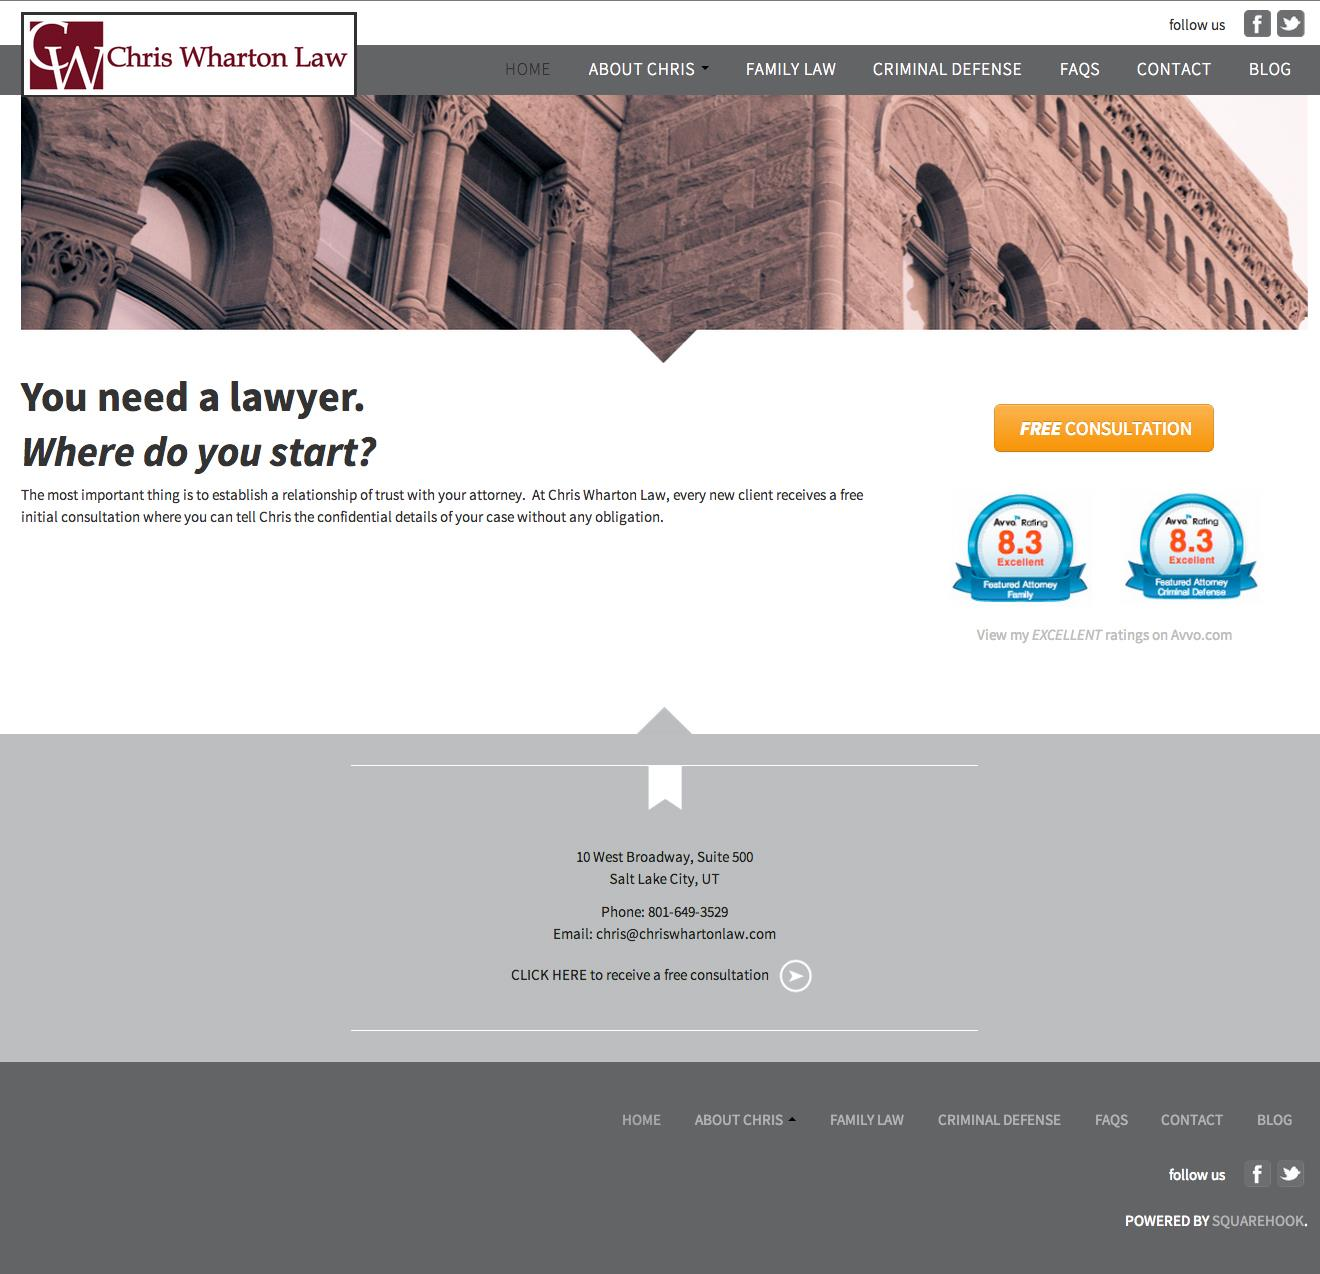 Chris Wharton Law